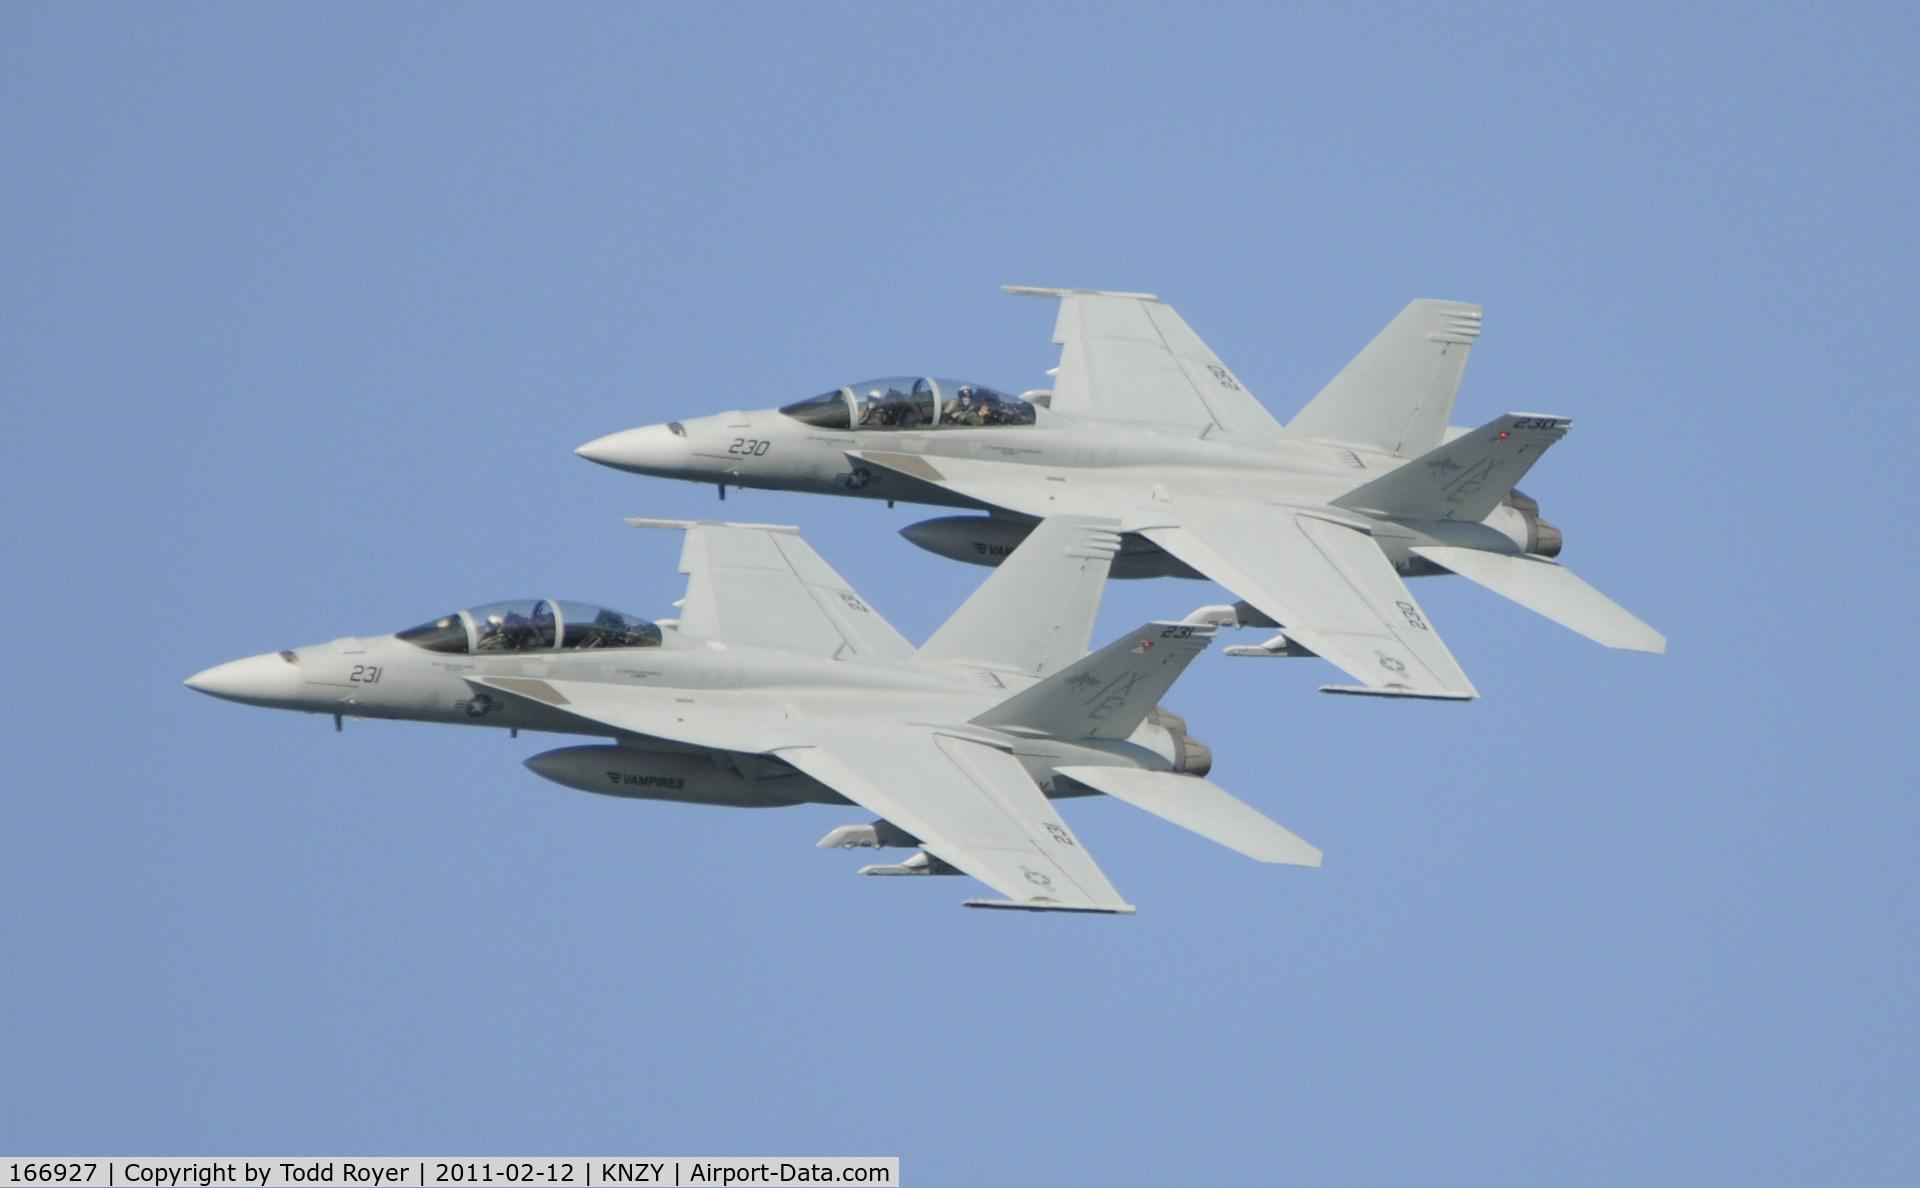 166927, Boeing F/A-18F Super Hornet C/N F183, Centennial of Naval Aviation